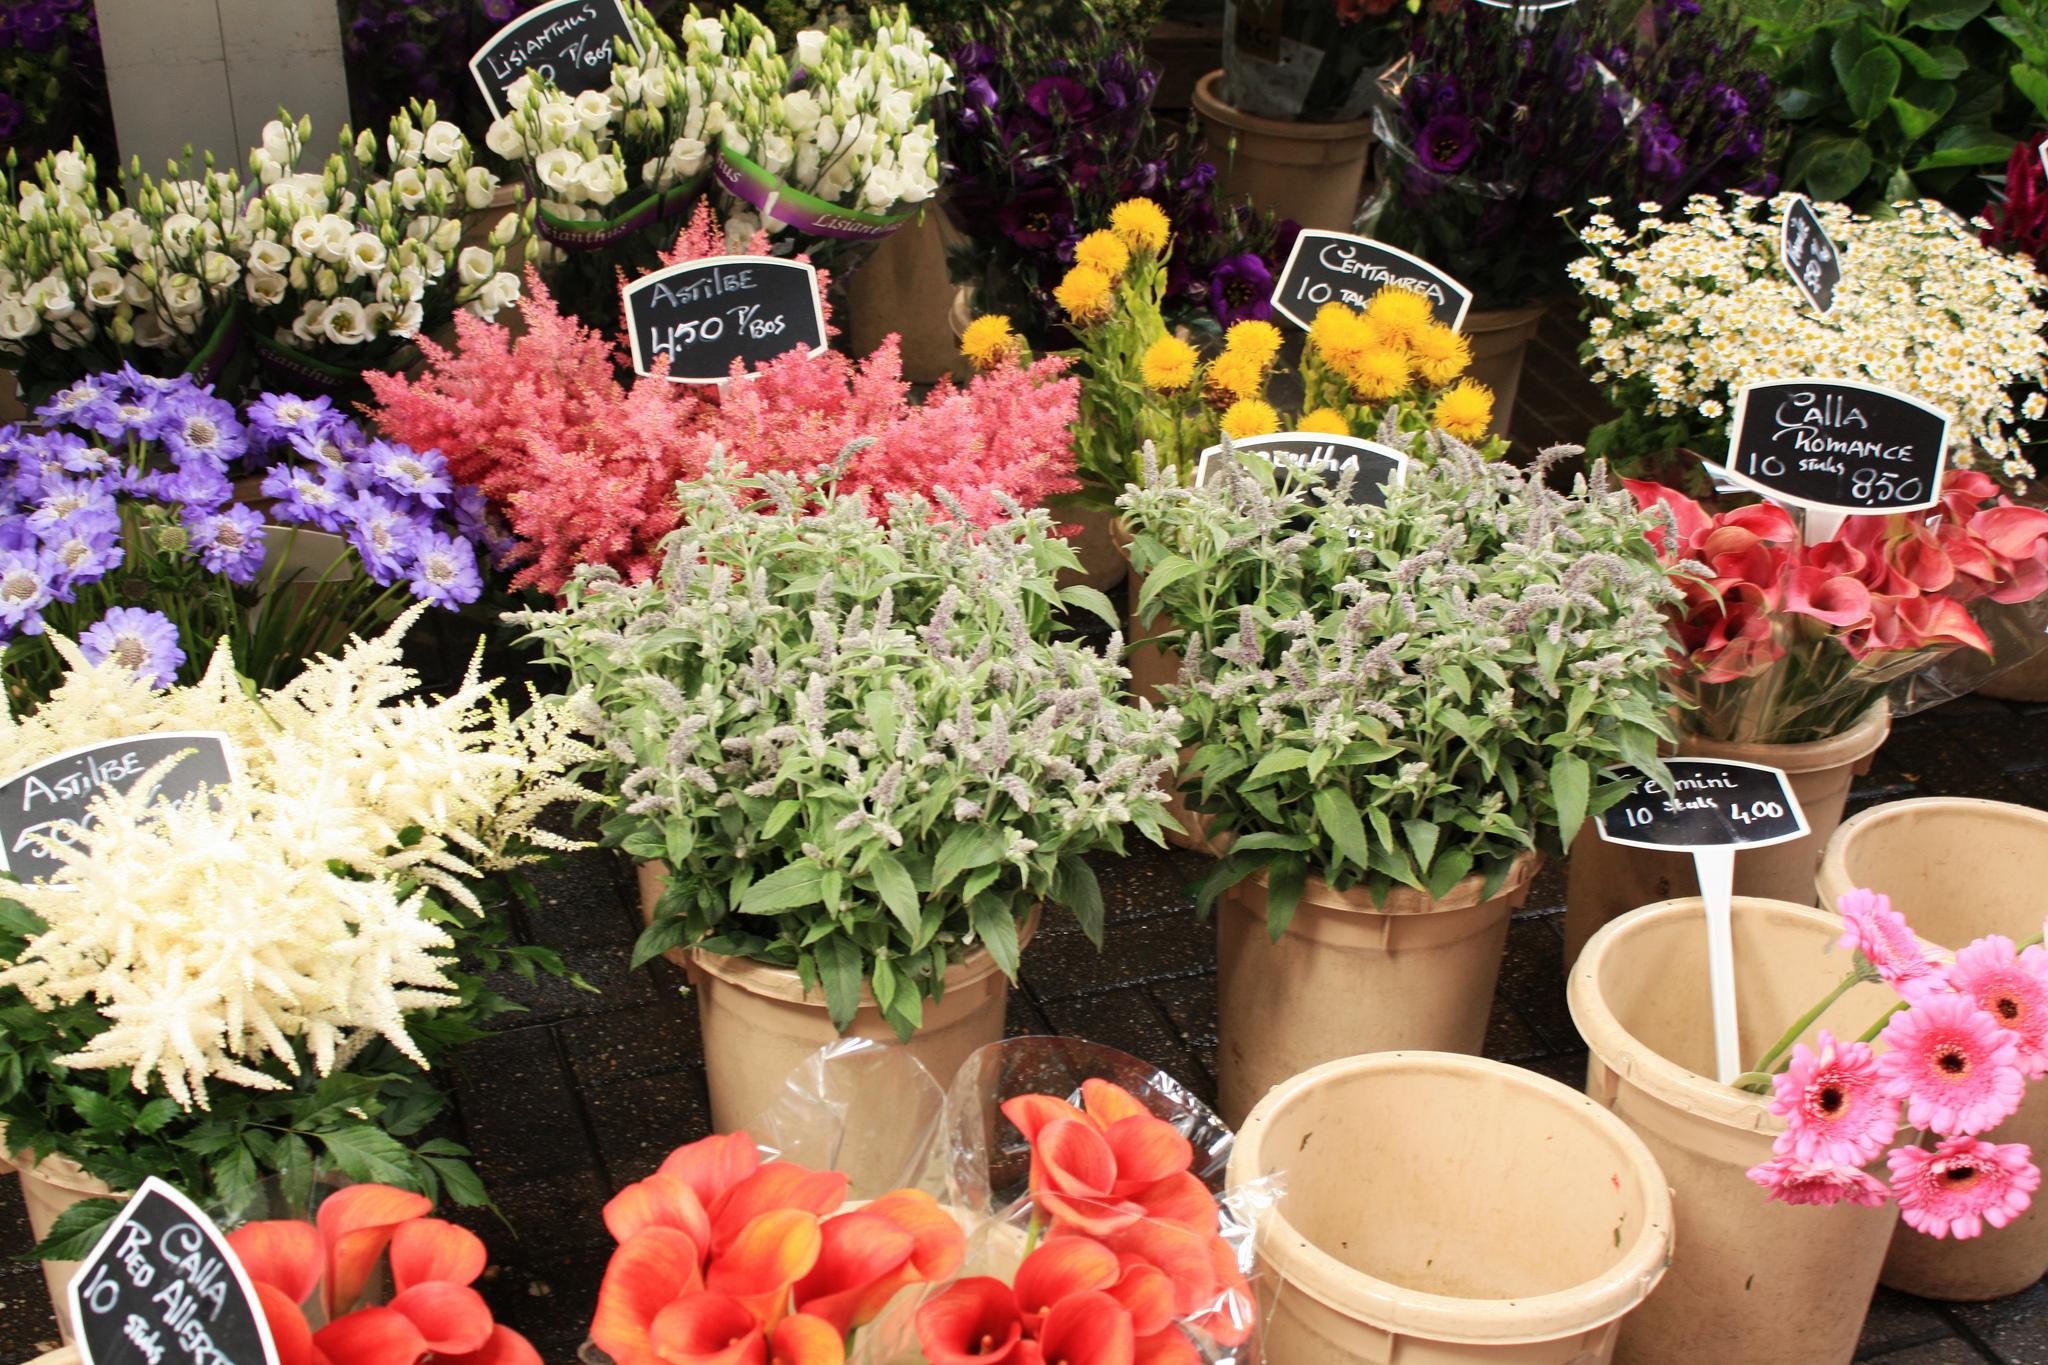 Цветы на рынке Блуменмаркт, Амстердам